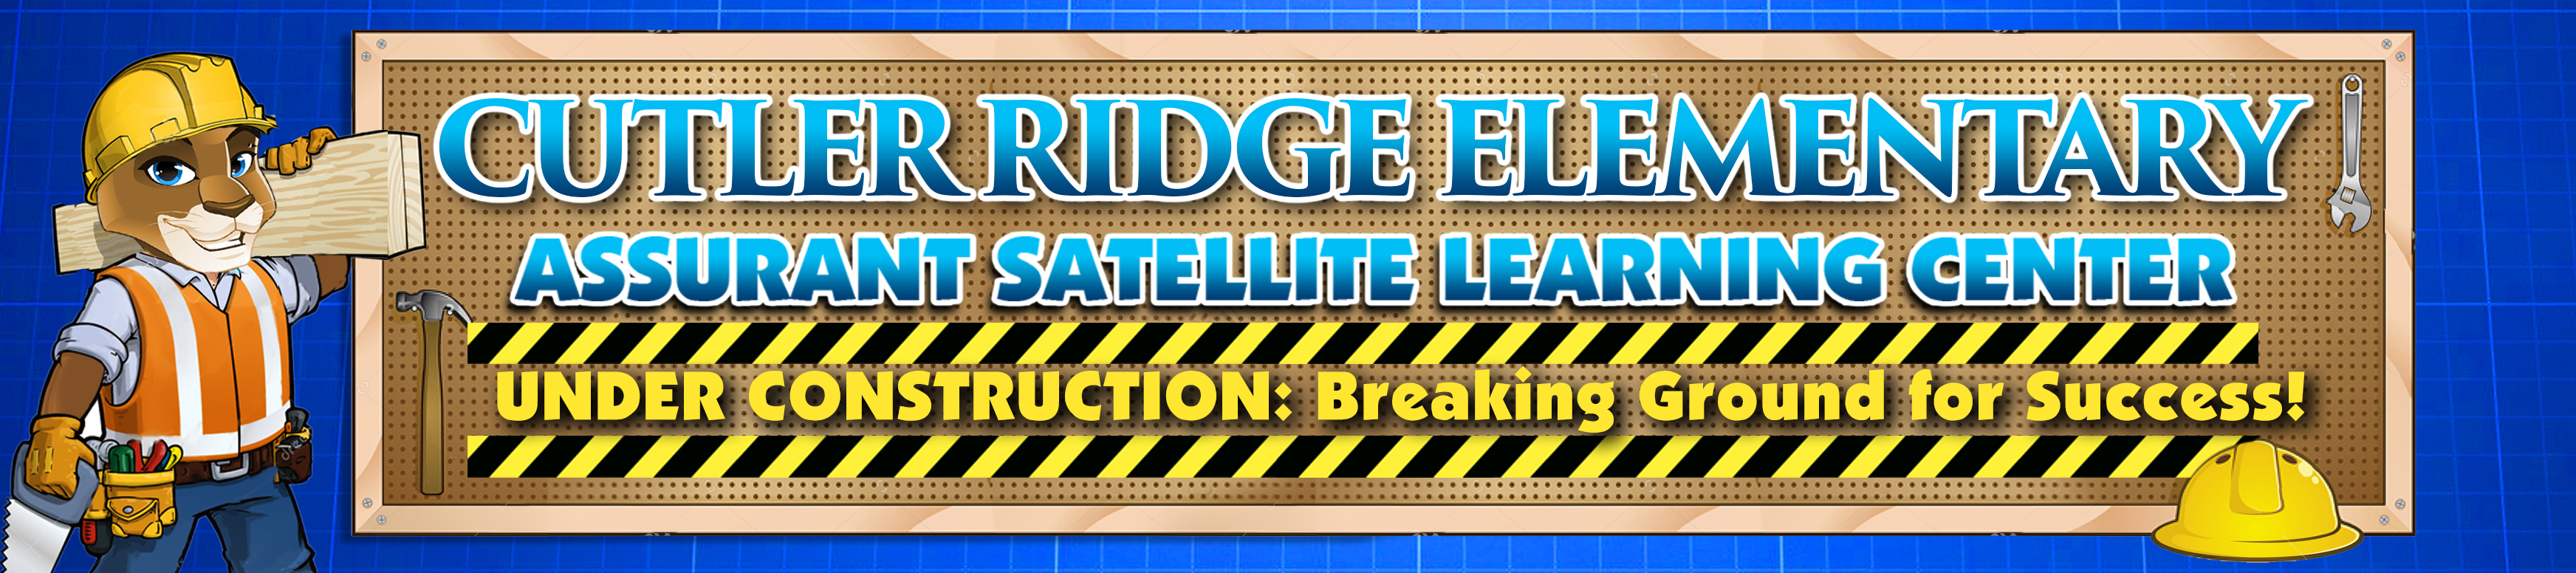 Cutler Ridge Elementary Banner